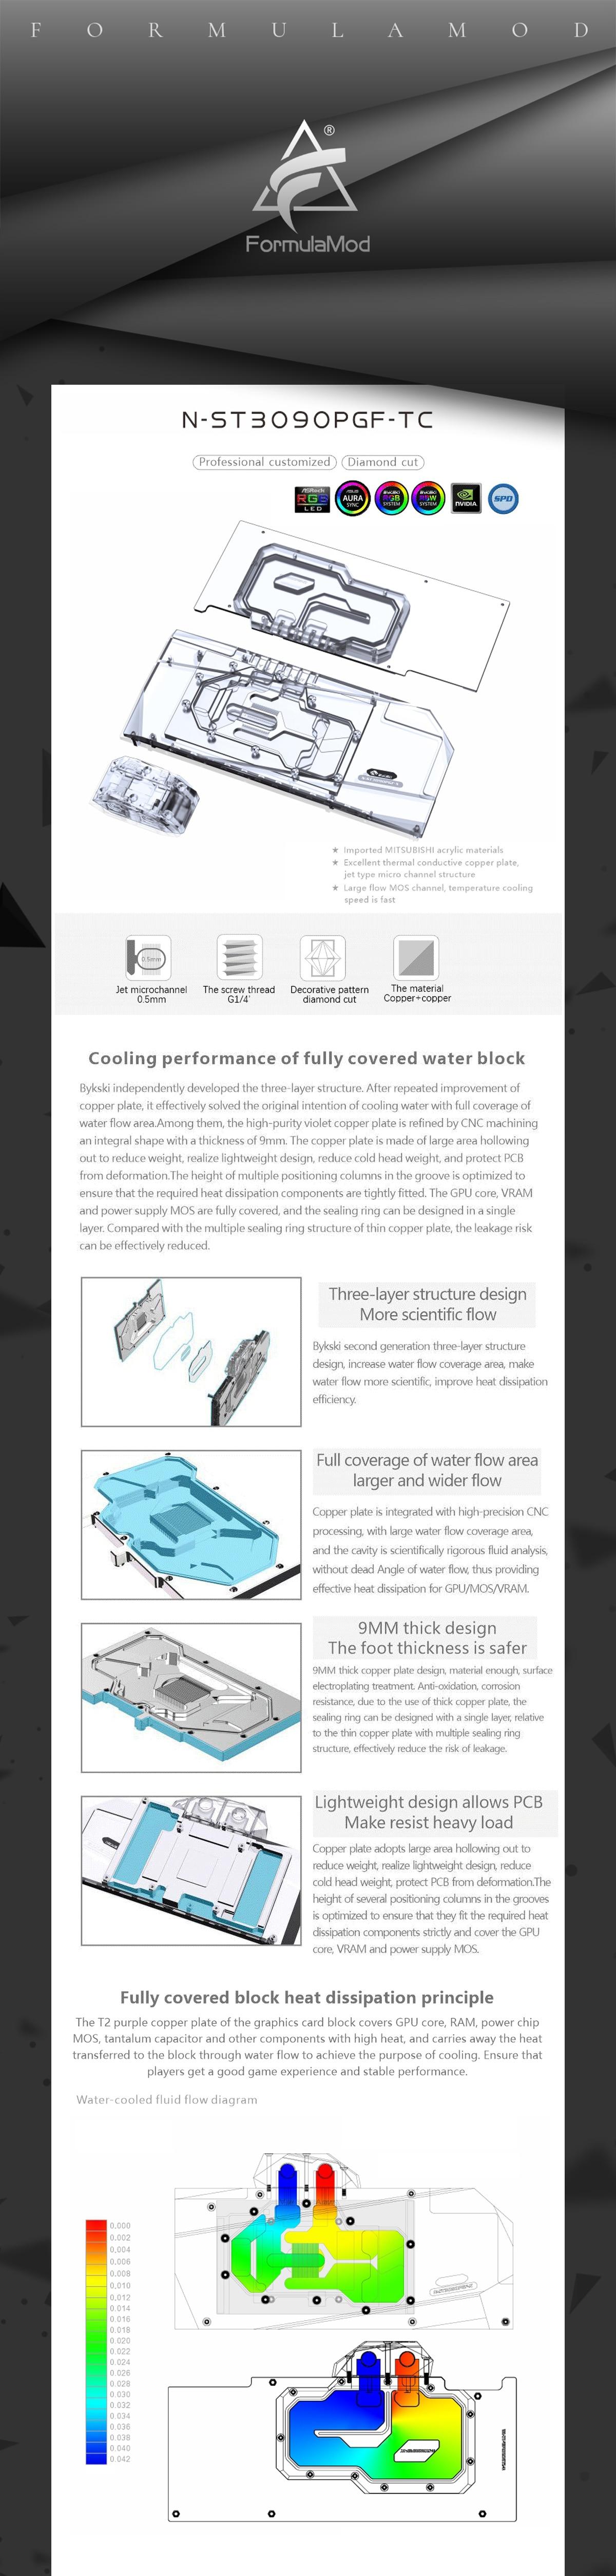 Bykski GPU Block With Active Waterway Backplane Cooler For Zotac RTX 3090 3080 PGF 24G6X 10G6X N-ST3090PGF-TC